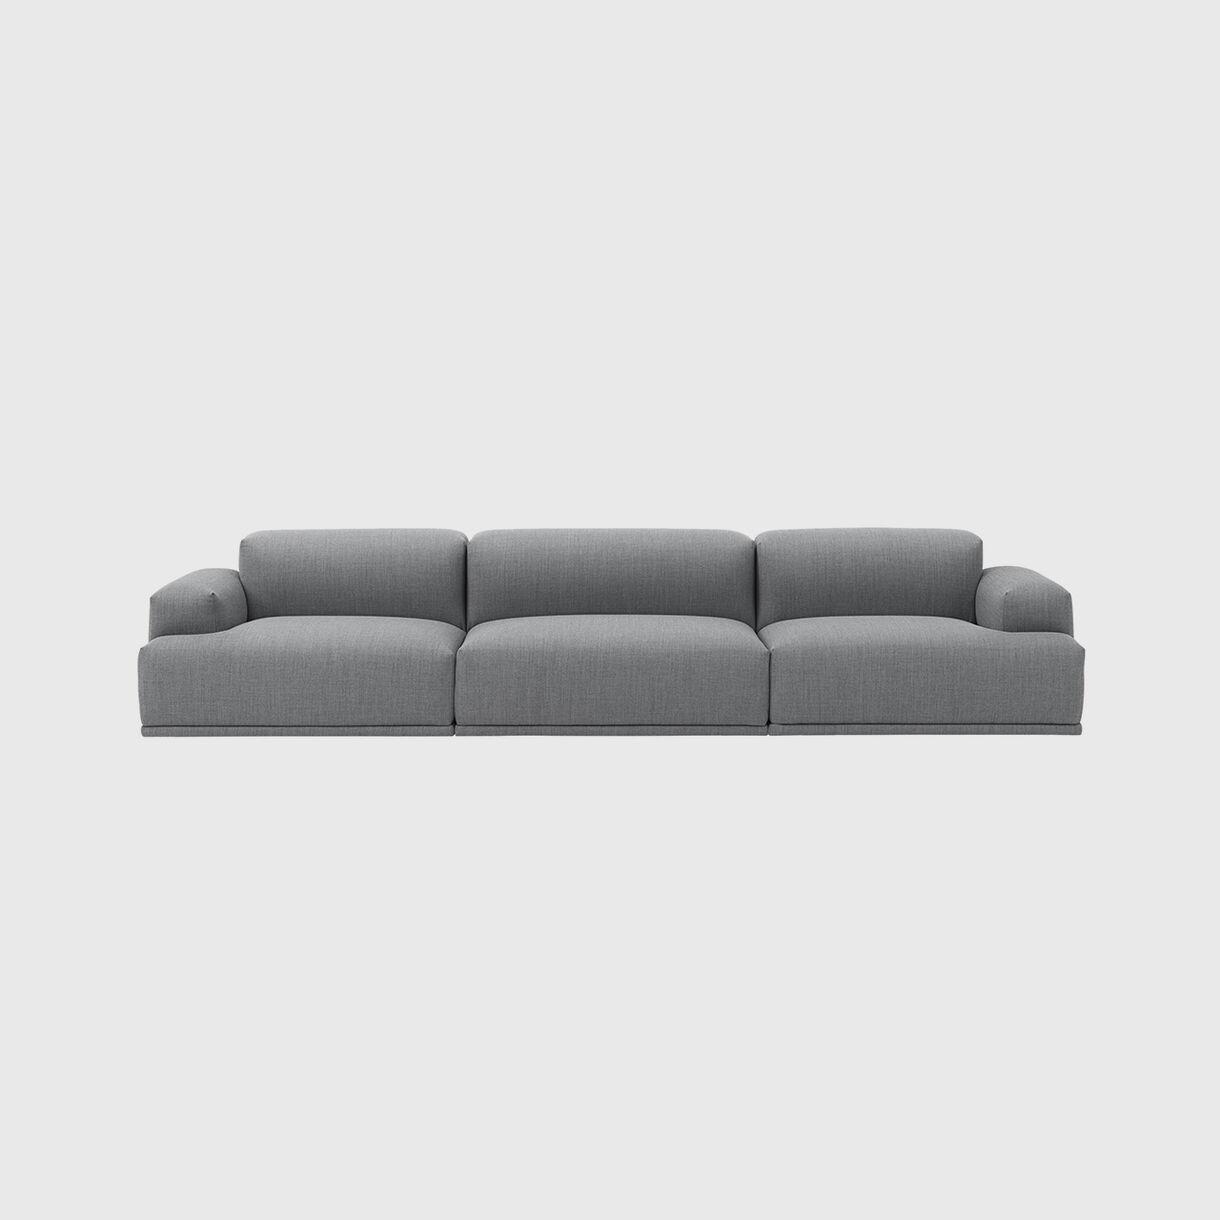 Connect Modular Sofa, 3 Seater, Fiord 151